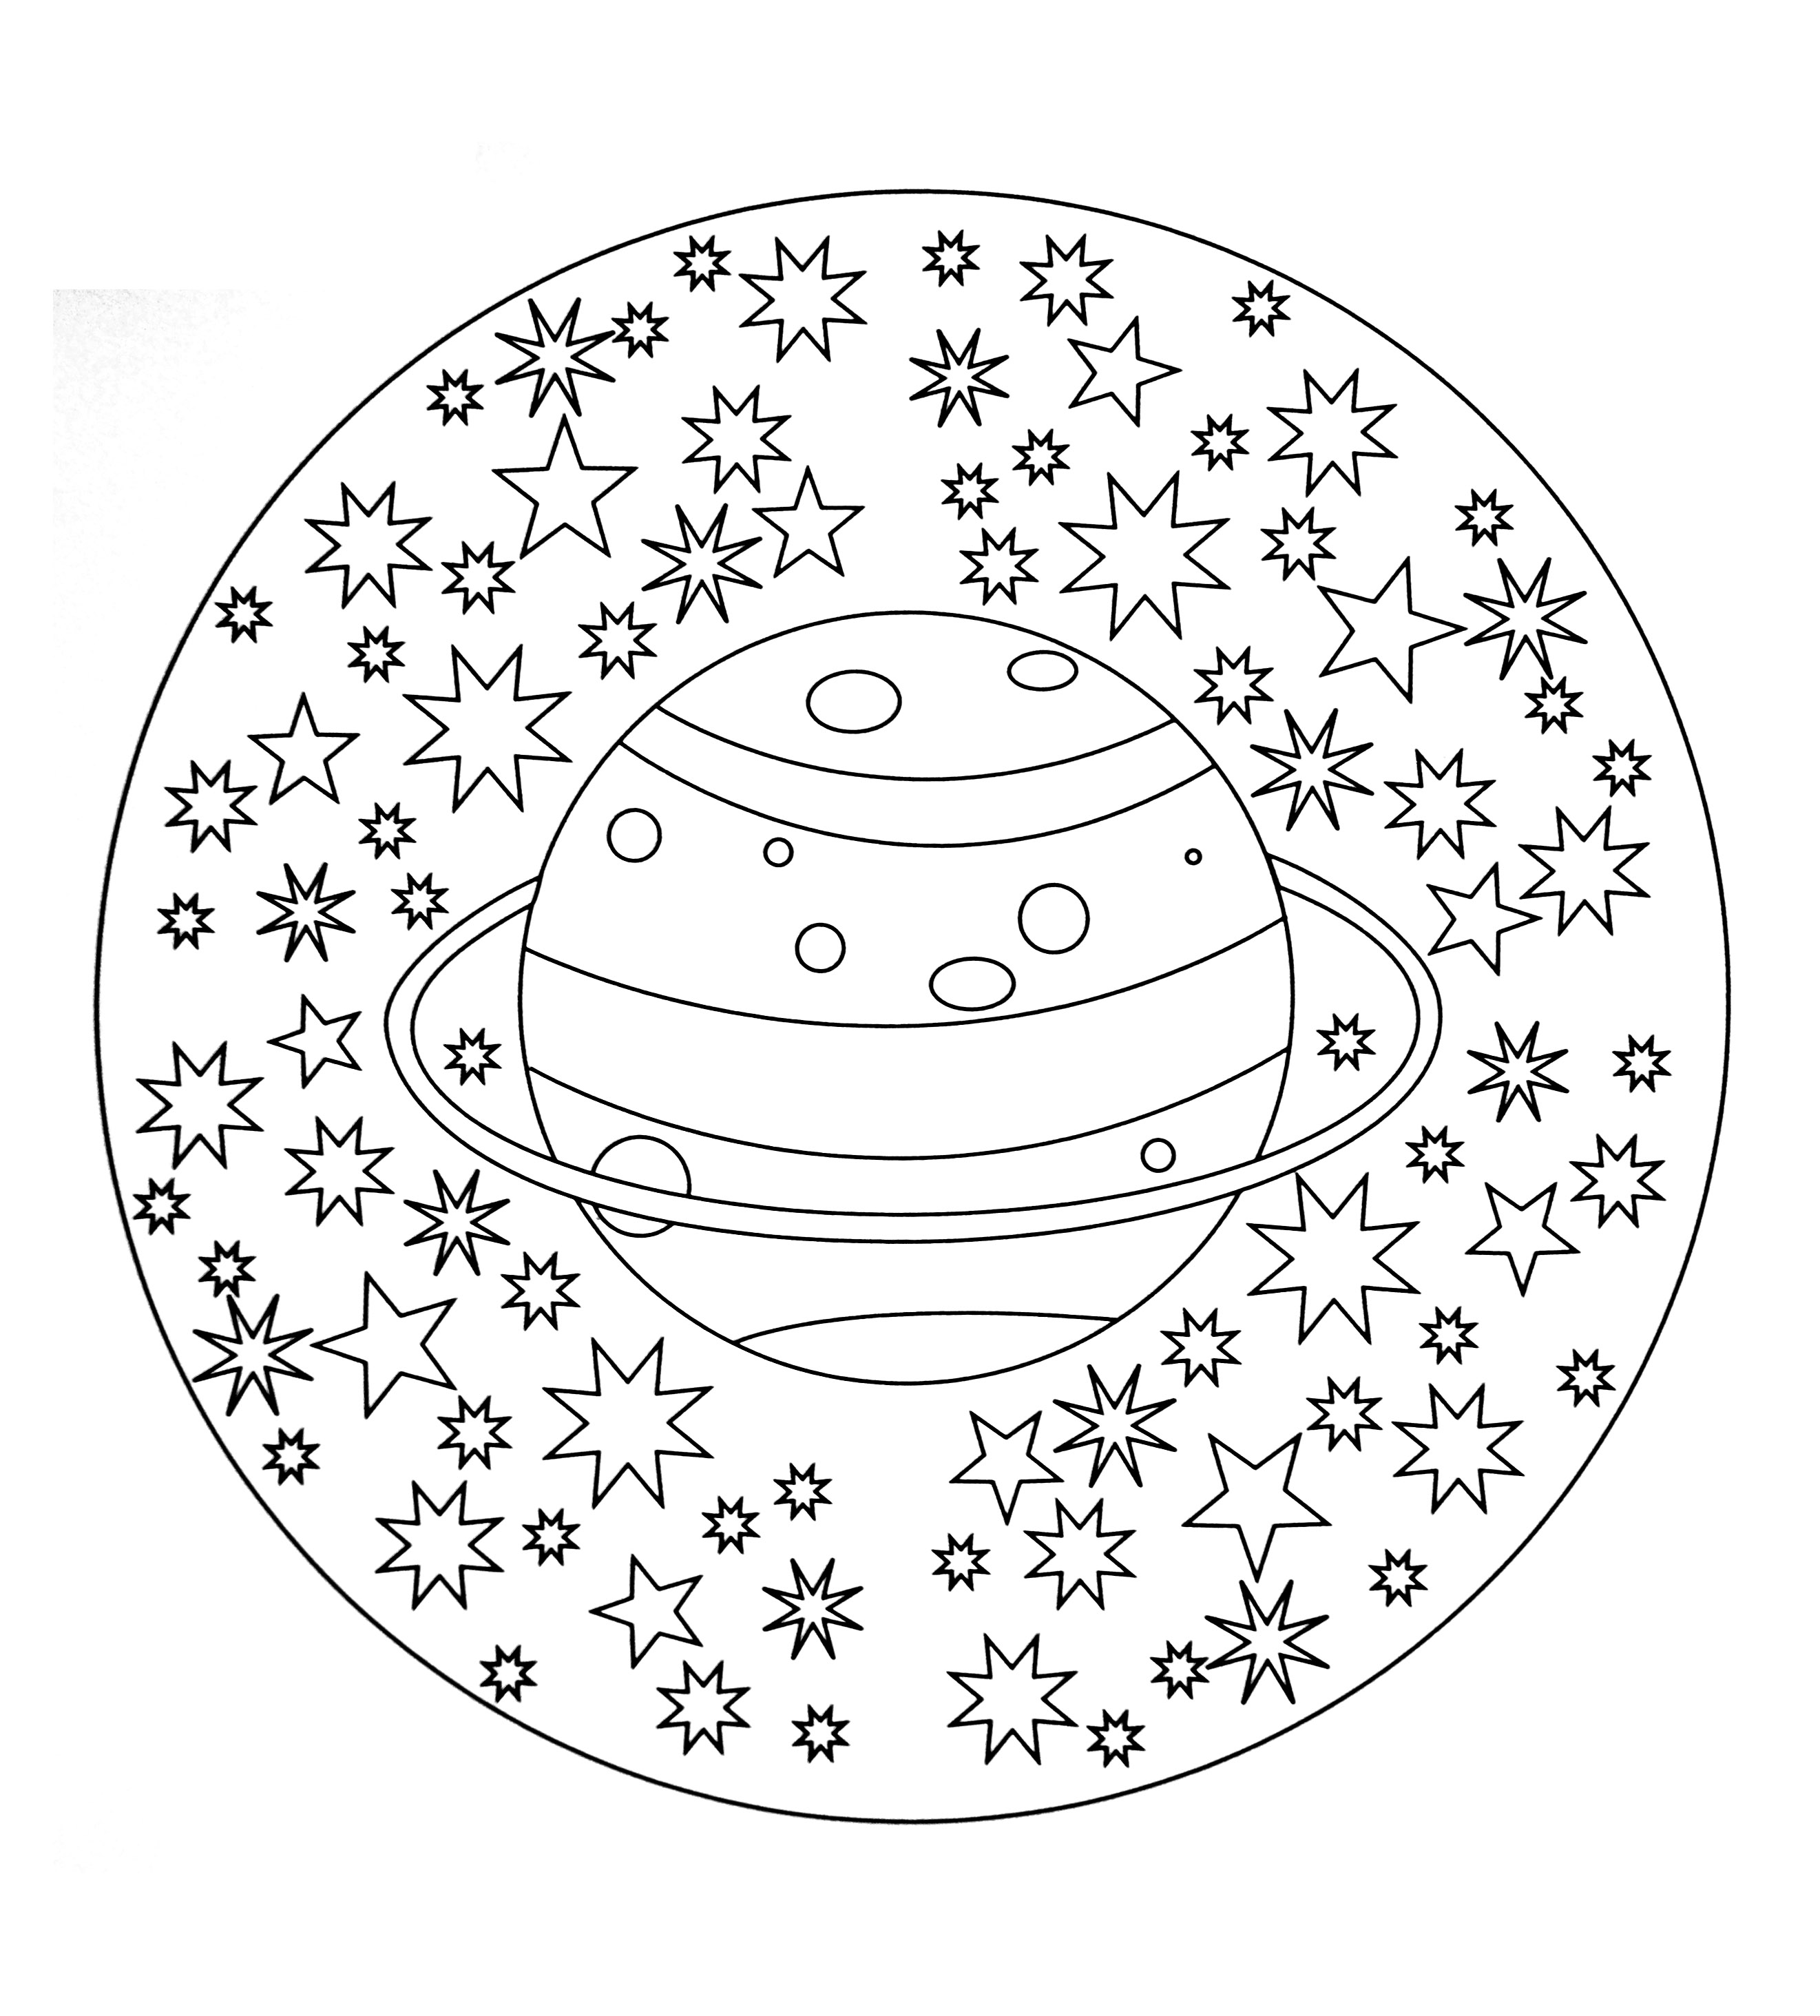 Mandalas To Color For Children Mandalas Kids Coloring Pages